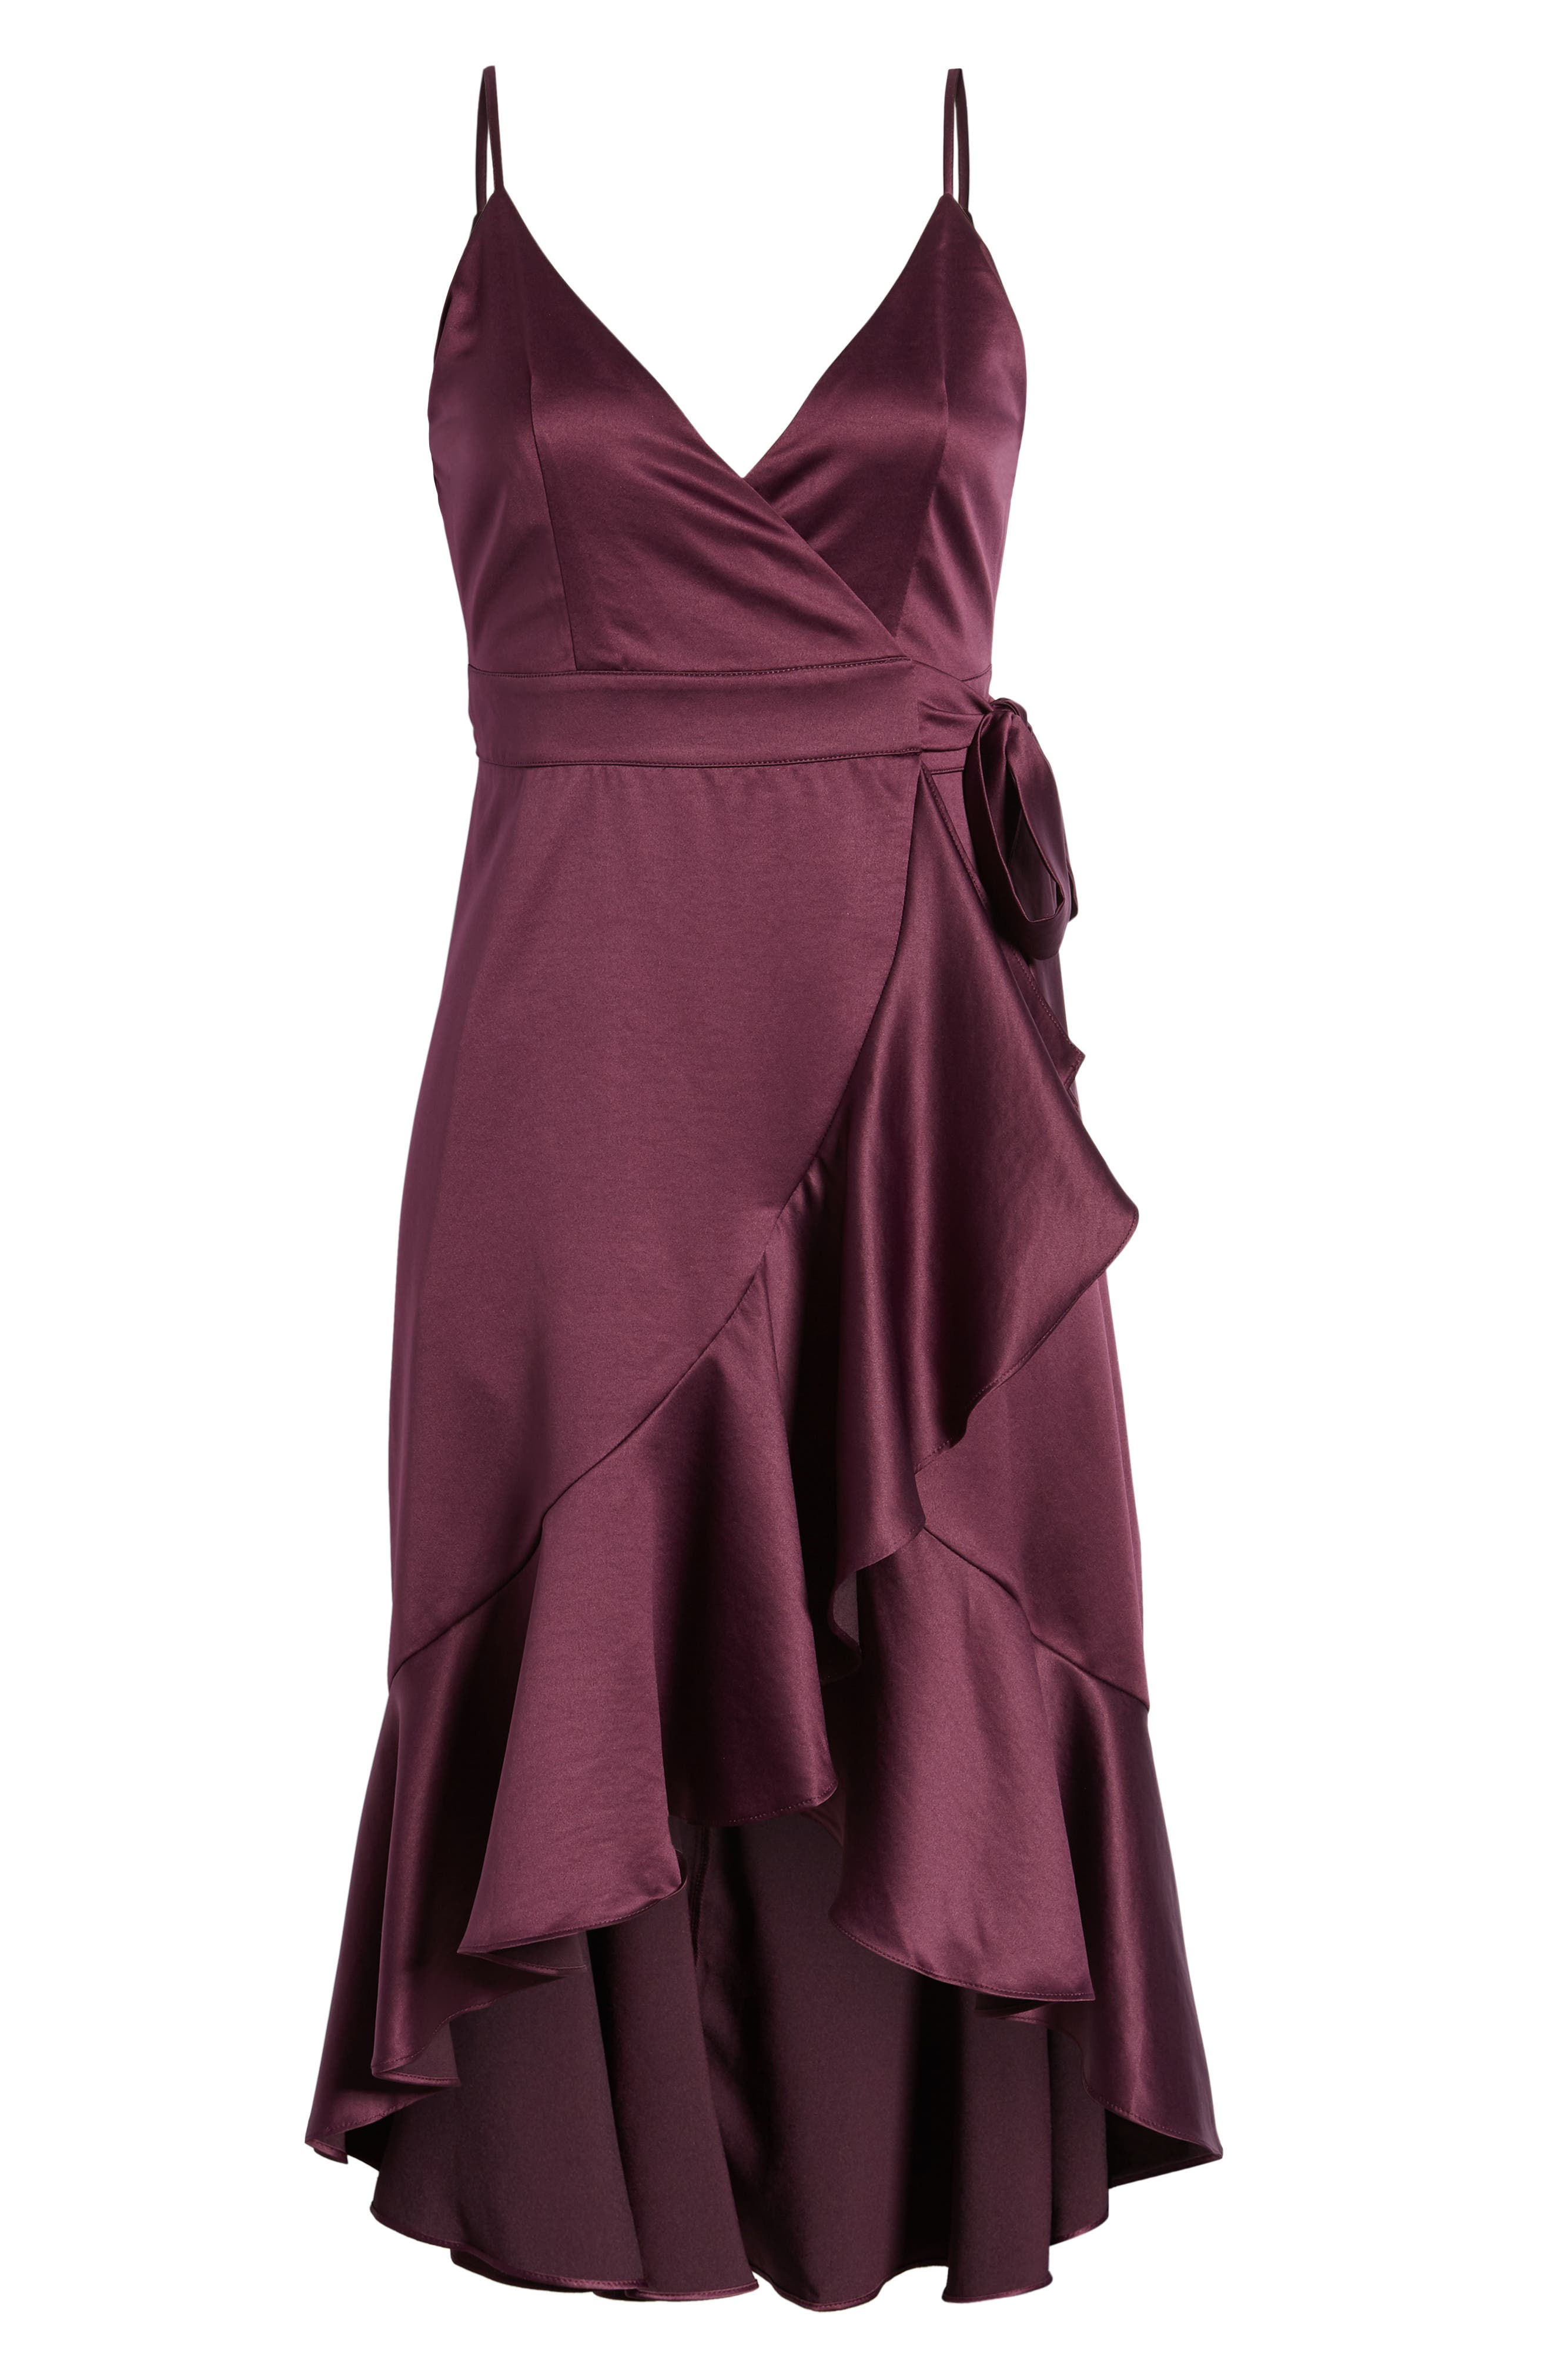 BAND OF GYPSIES,                             Payton Ruffled High/Low Dress,                             Alternate thumbnail 7, color,                             PLUM